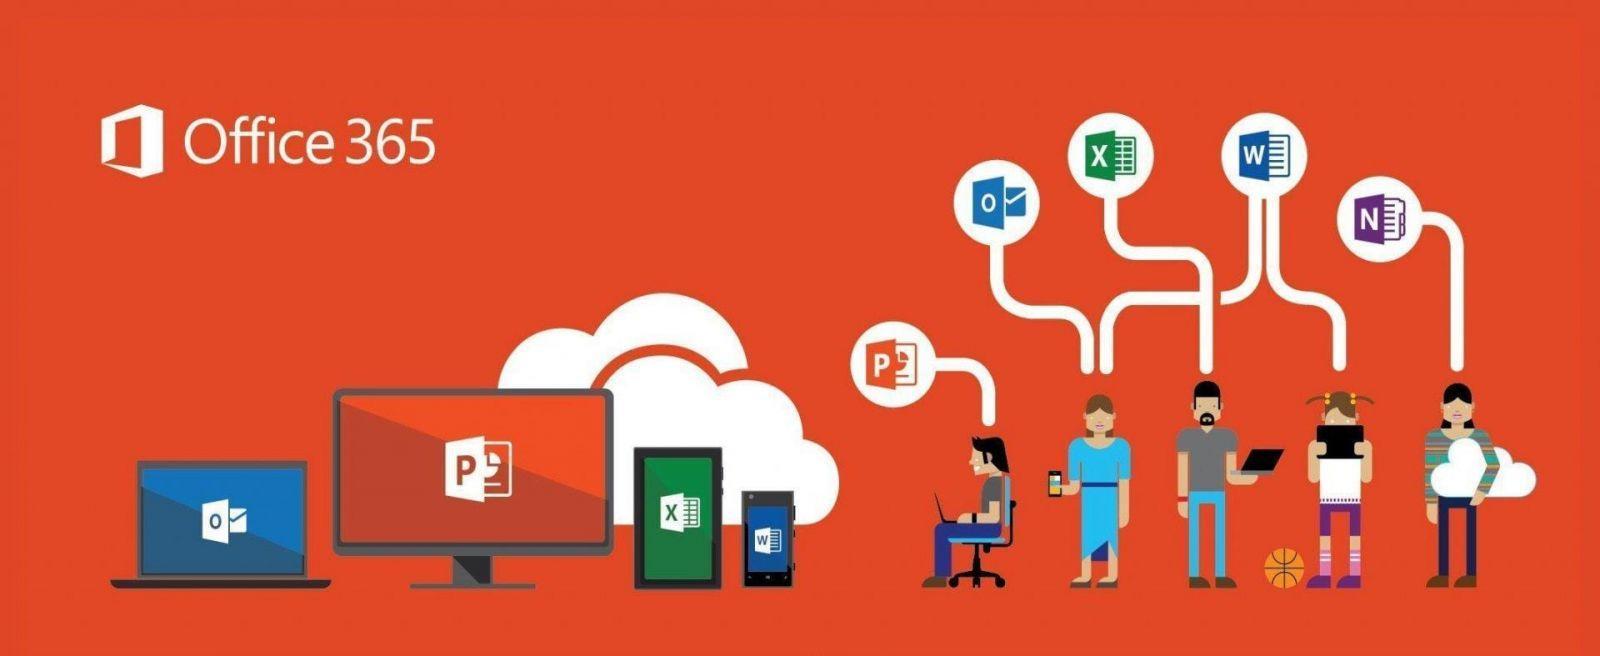 Немецкие школы запрещают Microsoft Office 365 (microsoftoffice365 e1535627938917)